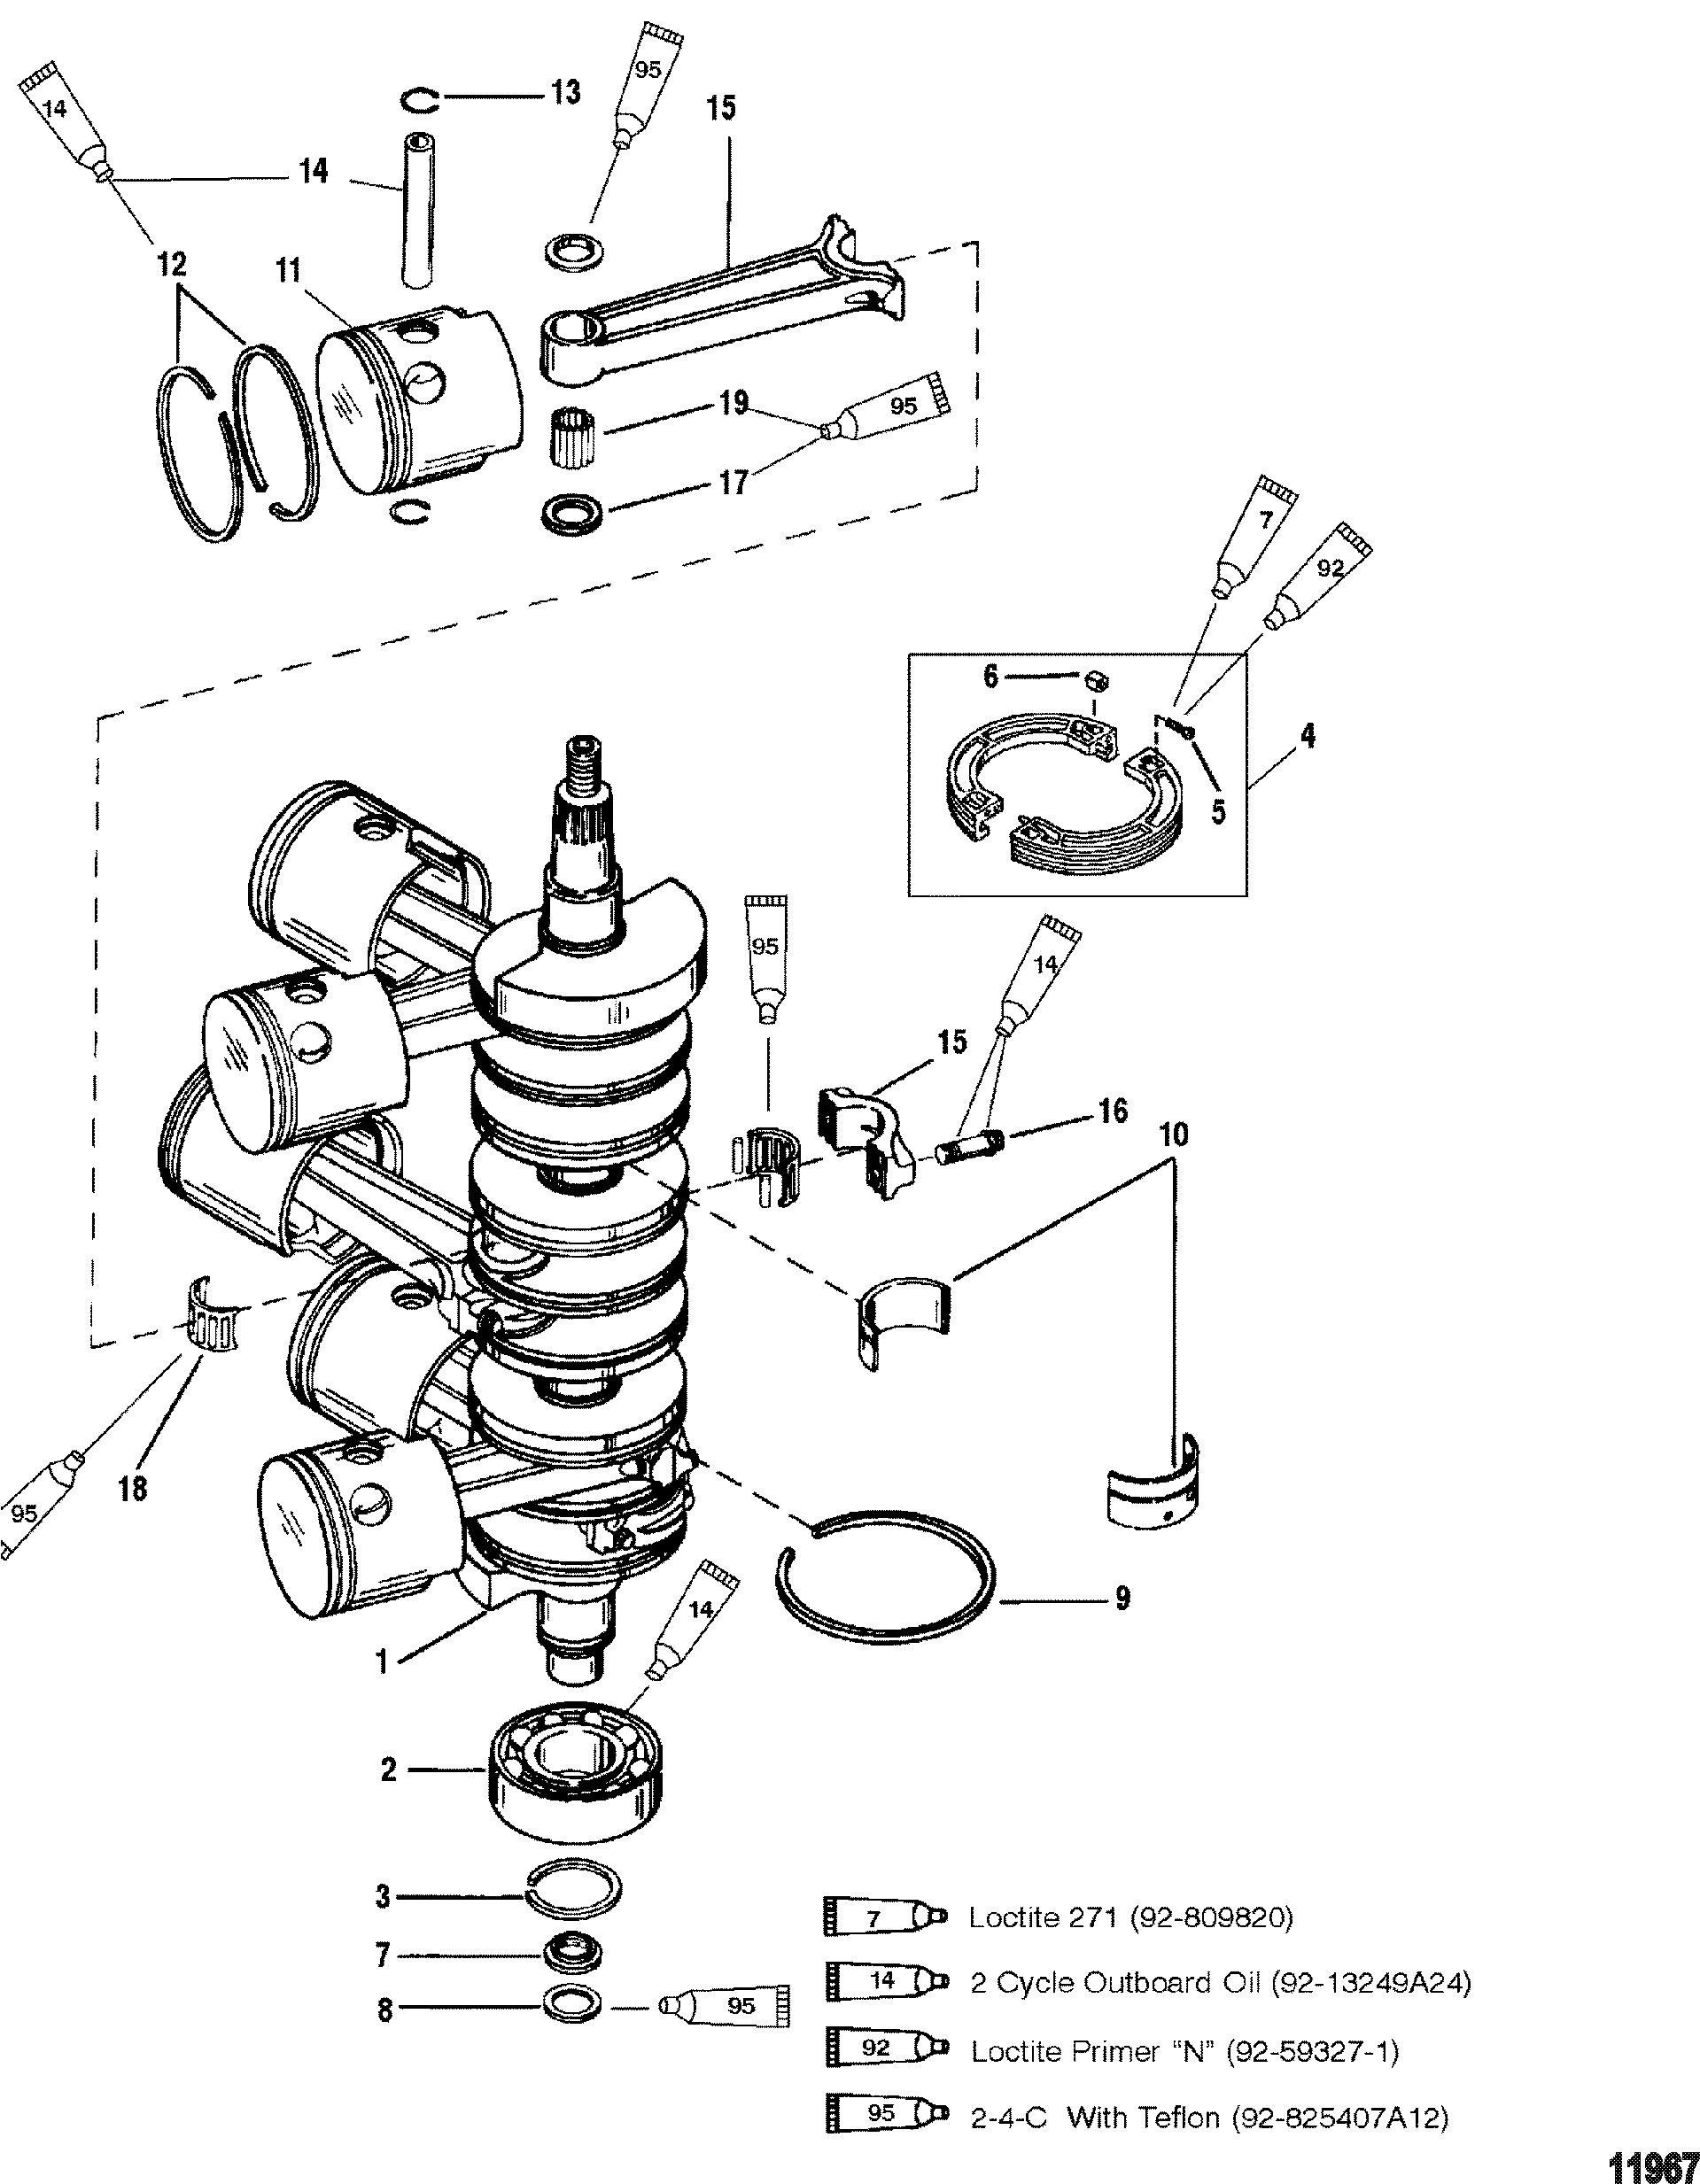 Каталог запчастей MARINER MAGNUM III 0G303046 THRU